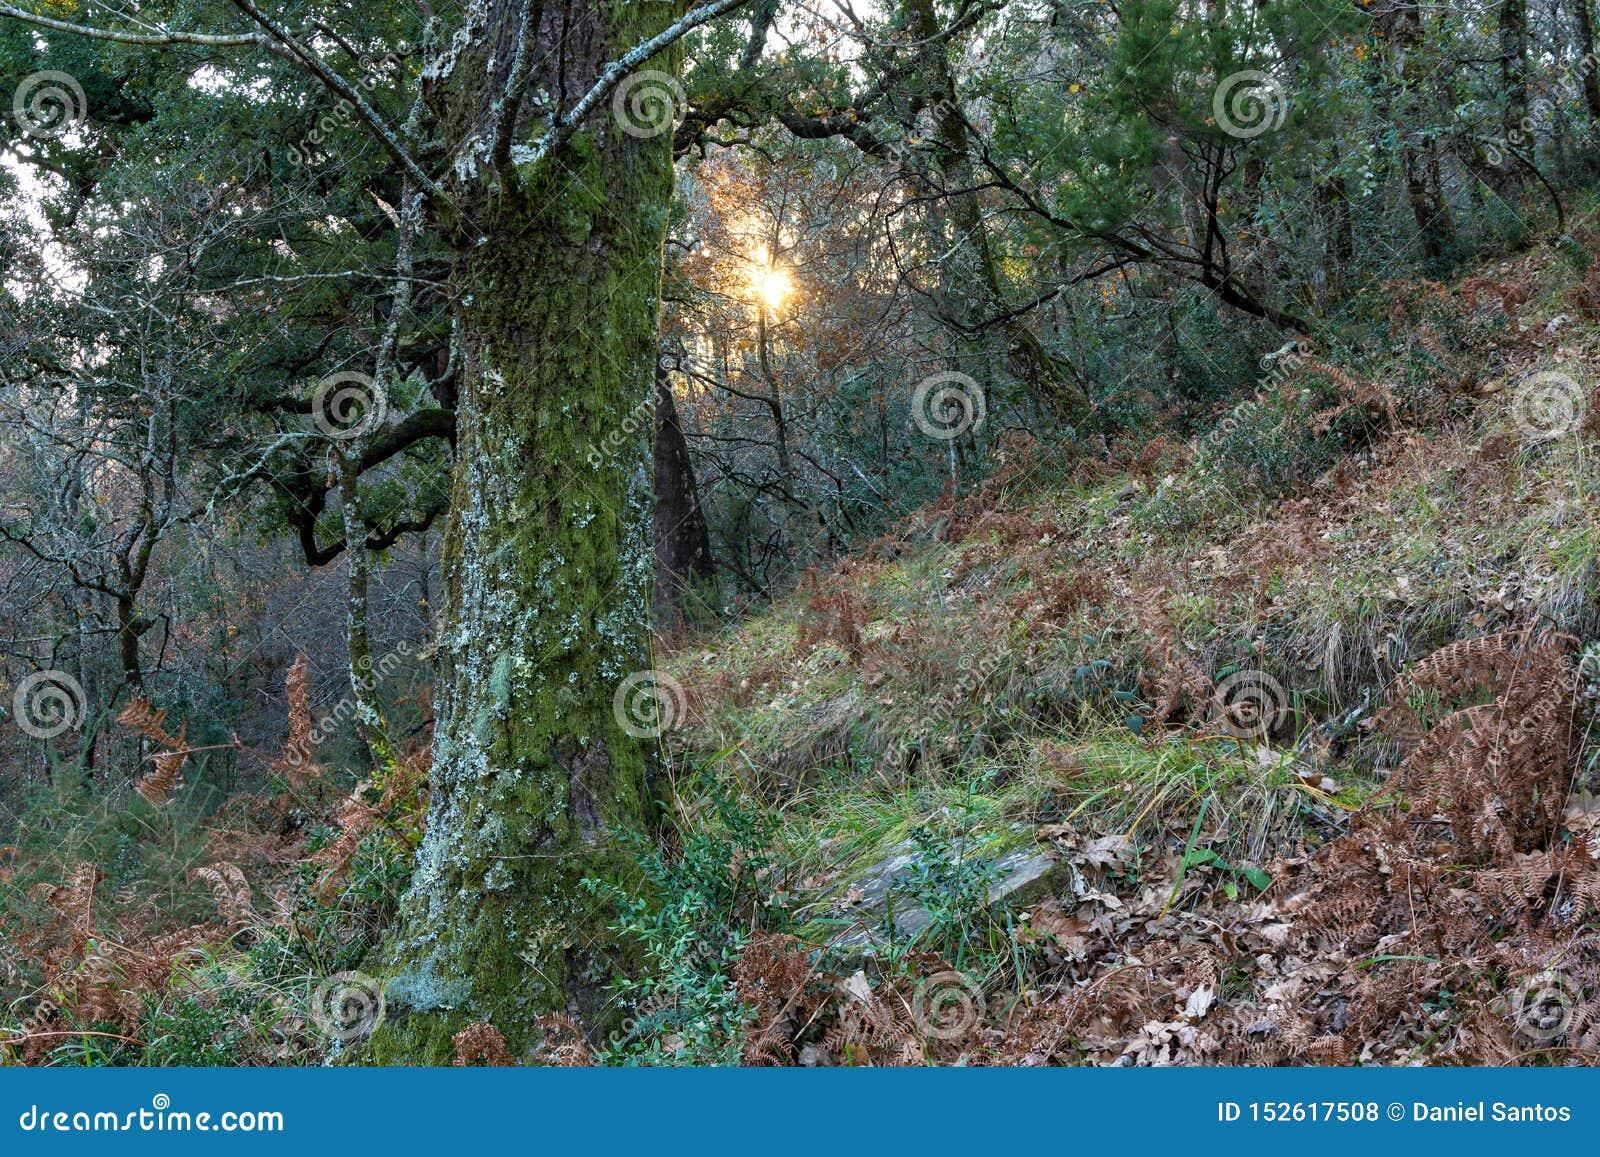 Oak forest with sun peeking through the vegetation